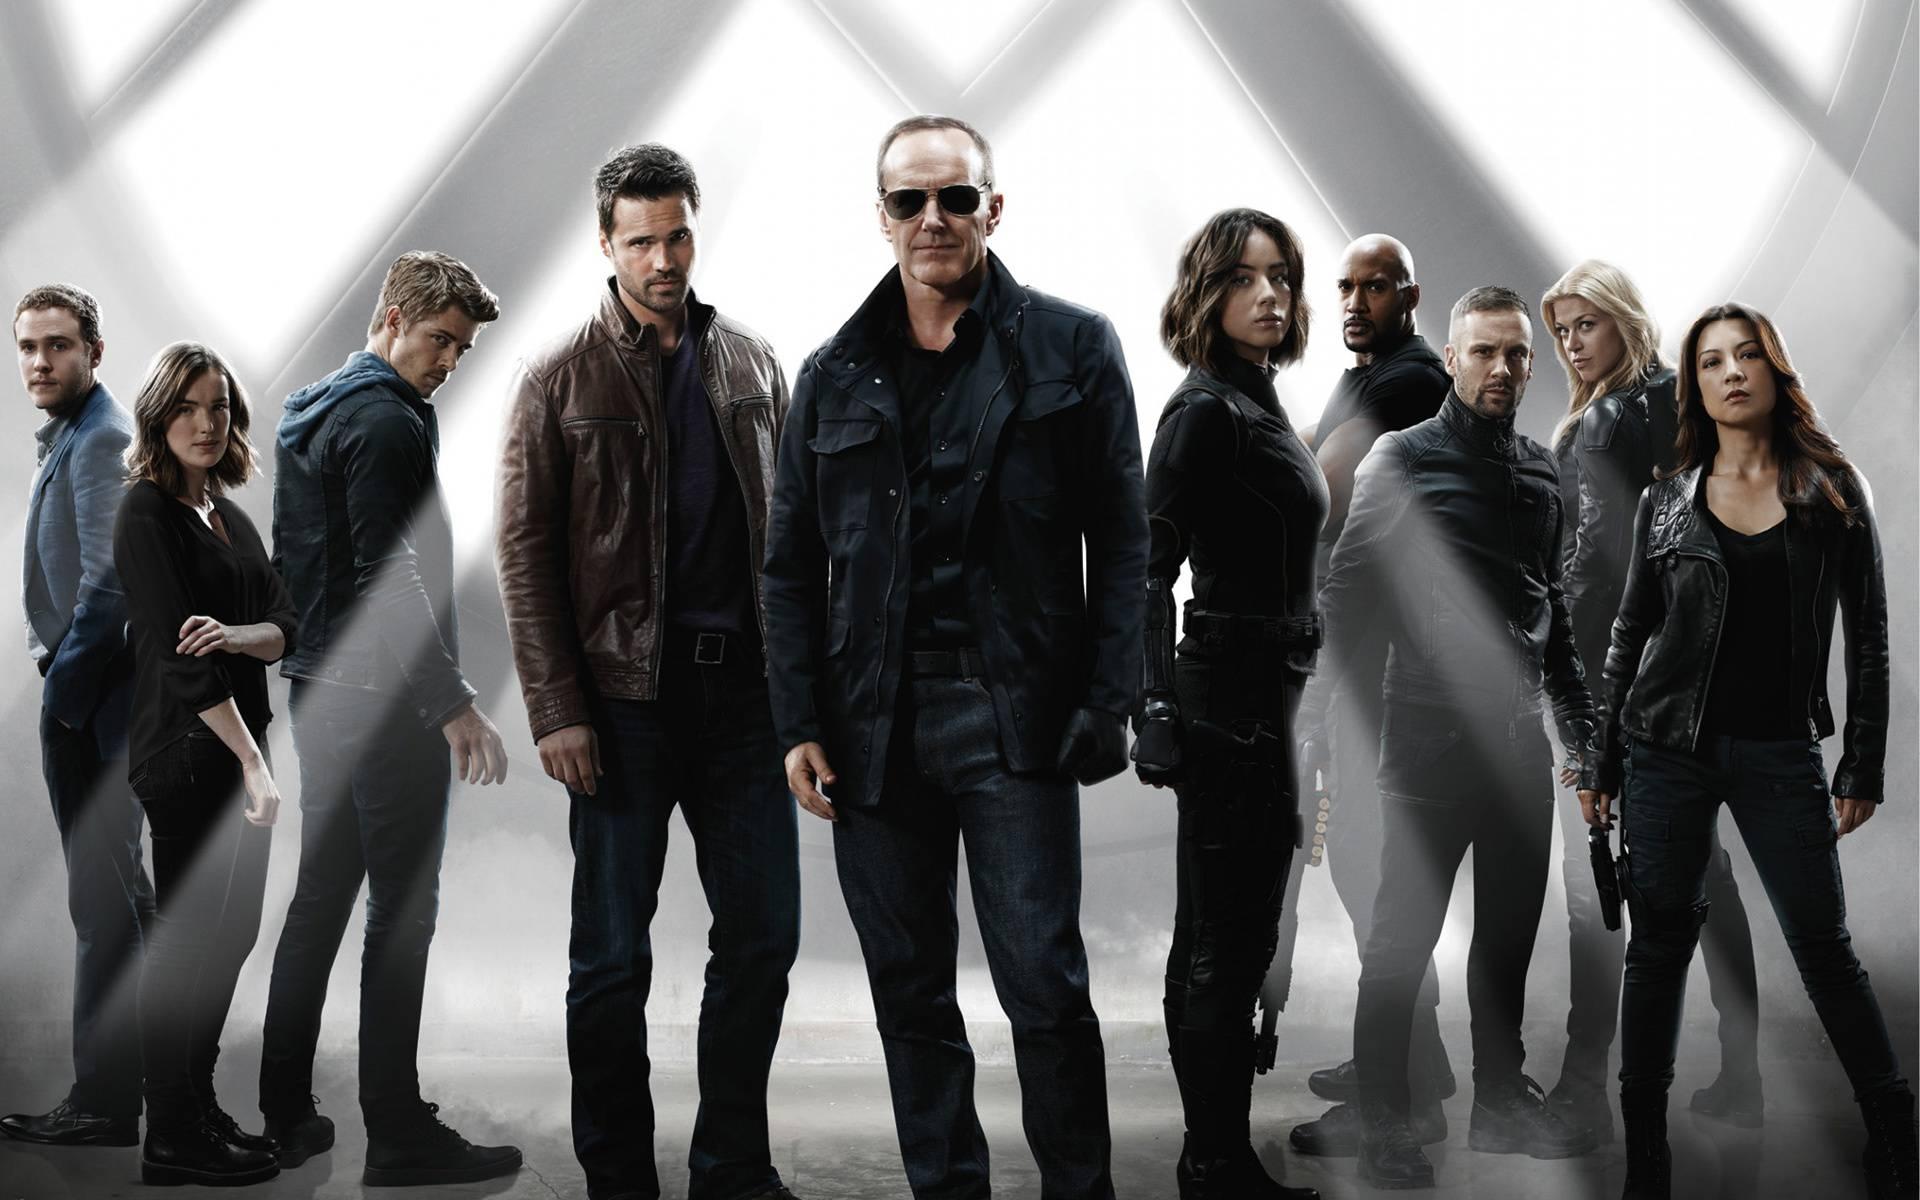 agents of shield season 3-1920x1200